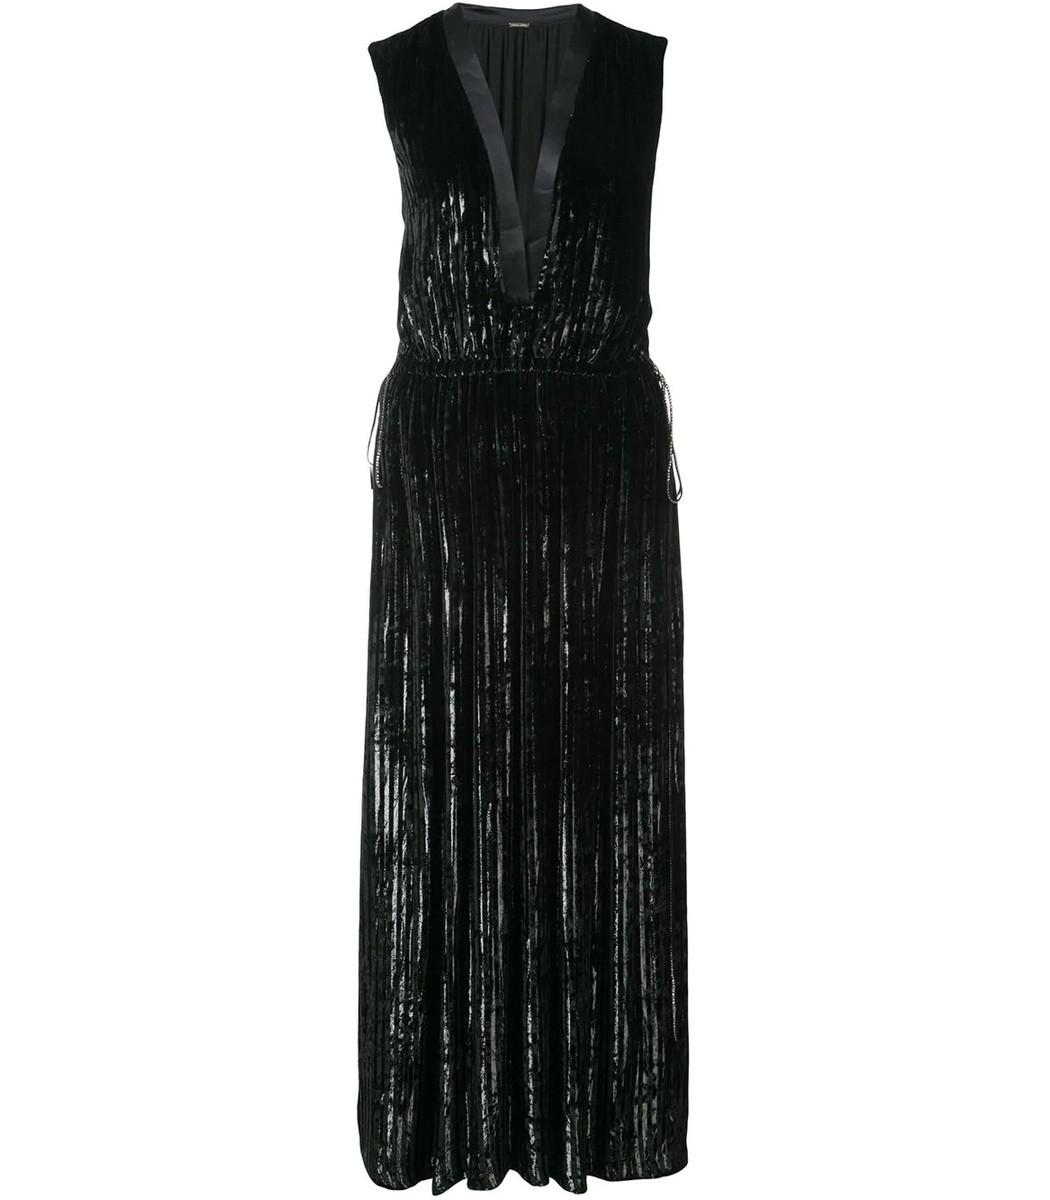 ADAM LIPPES Black Pleated Dress